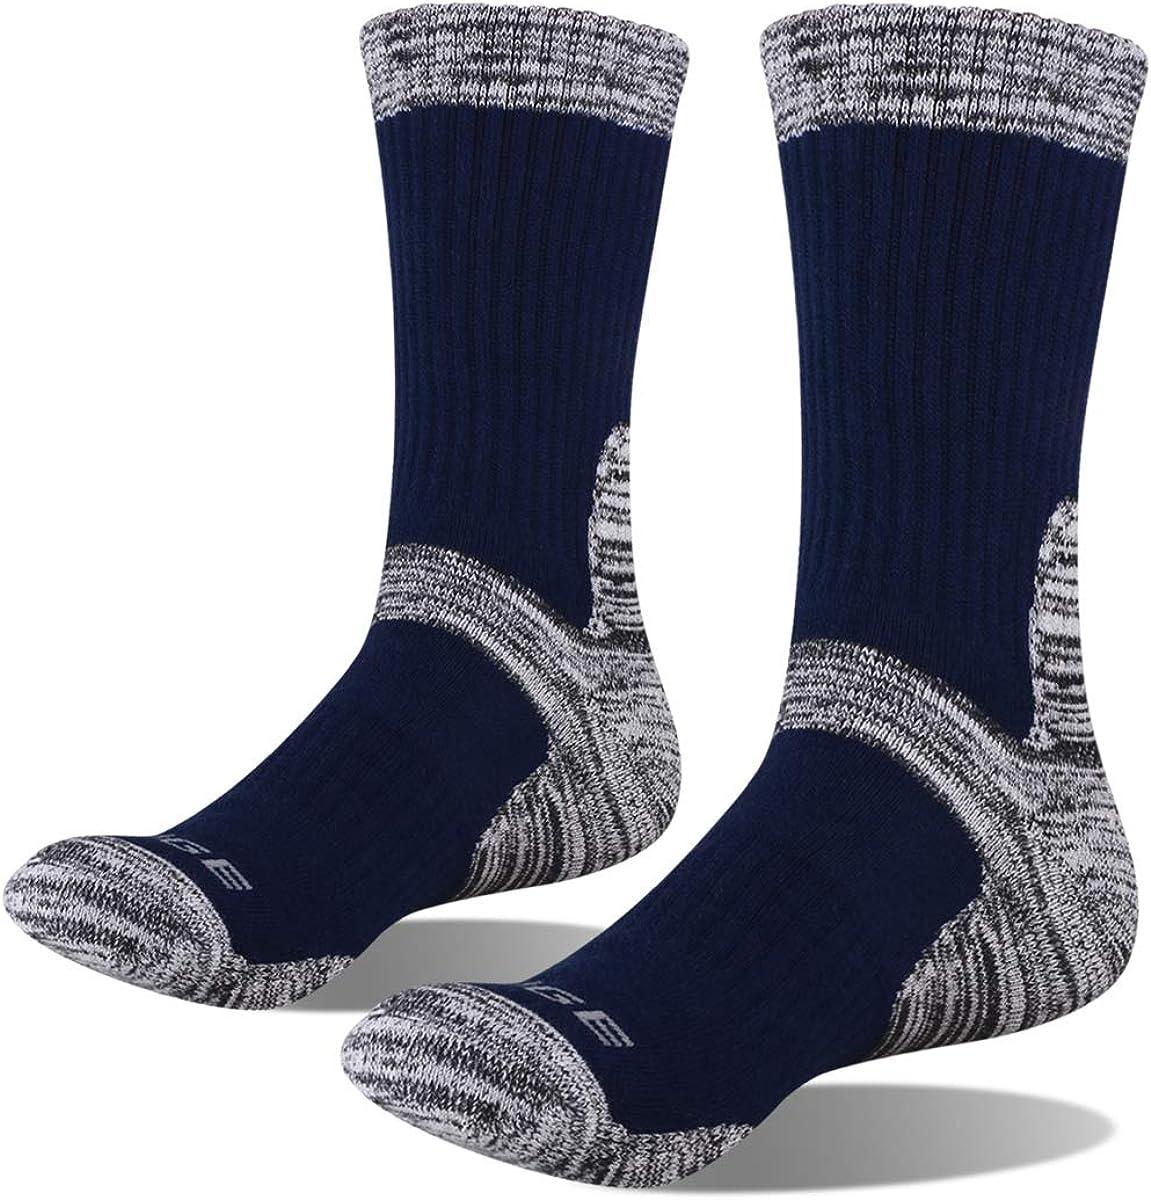 YUEDGE Herren Atmungsaktiv Baumwolle Sportsocken Wandersocken Arbeitssocken Dicke Warme Thermo Winter Socken 5 Paar f/ür M/änner 38-48